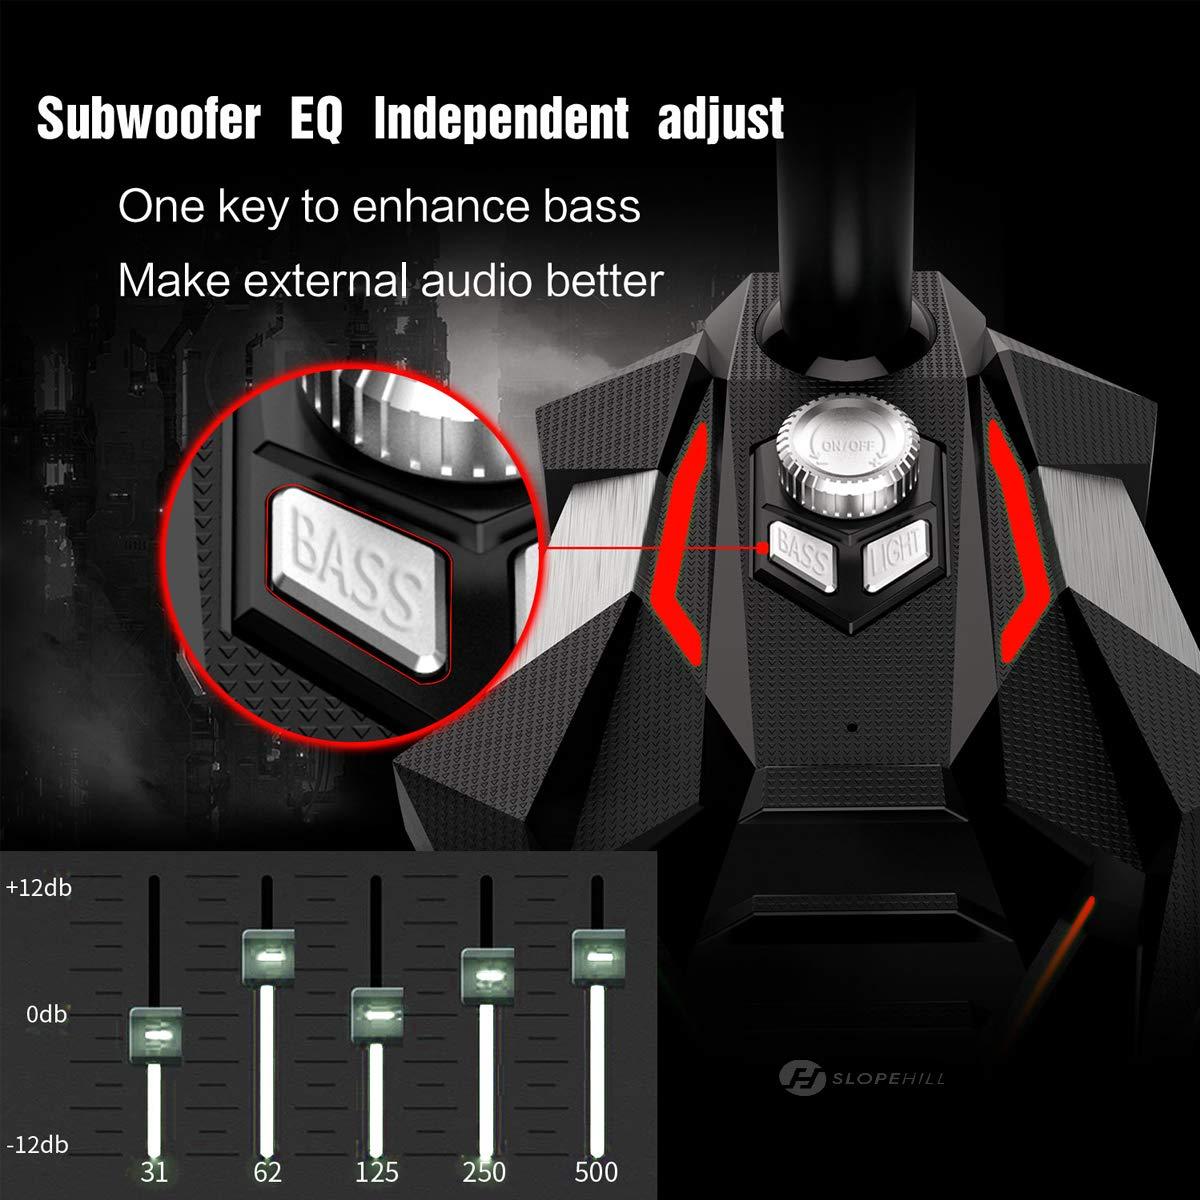 YouTube Micr/ófono Dual slopehill Omnidireccional Micr/ófono USB de Escritorio con Base para Jugadores Compatible con PC // Windows // Mac // PS4 para Radio Micr/ófono Gaming Skype Luz LED Juegos